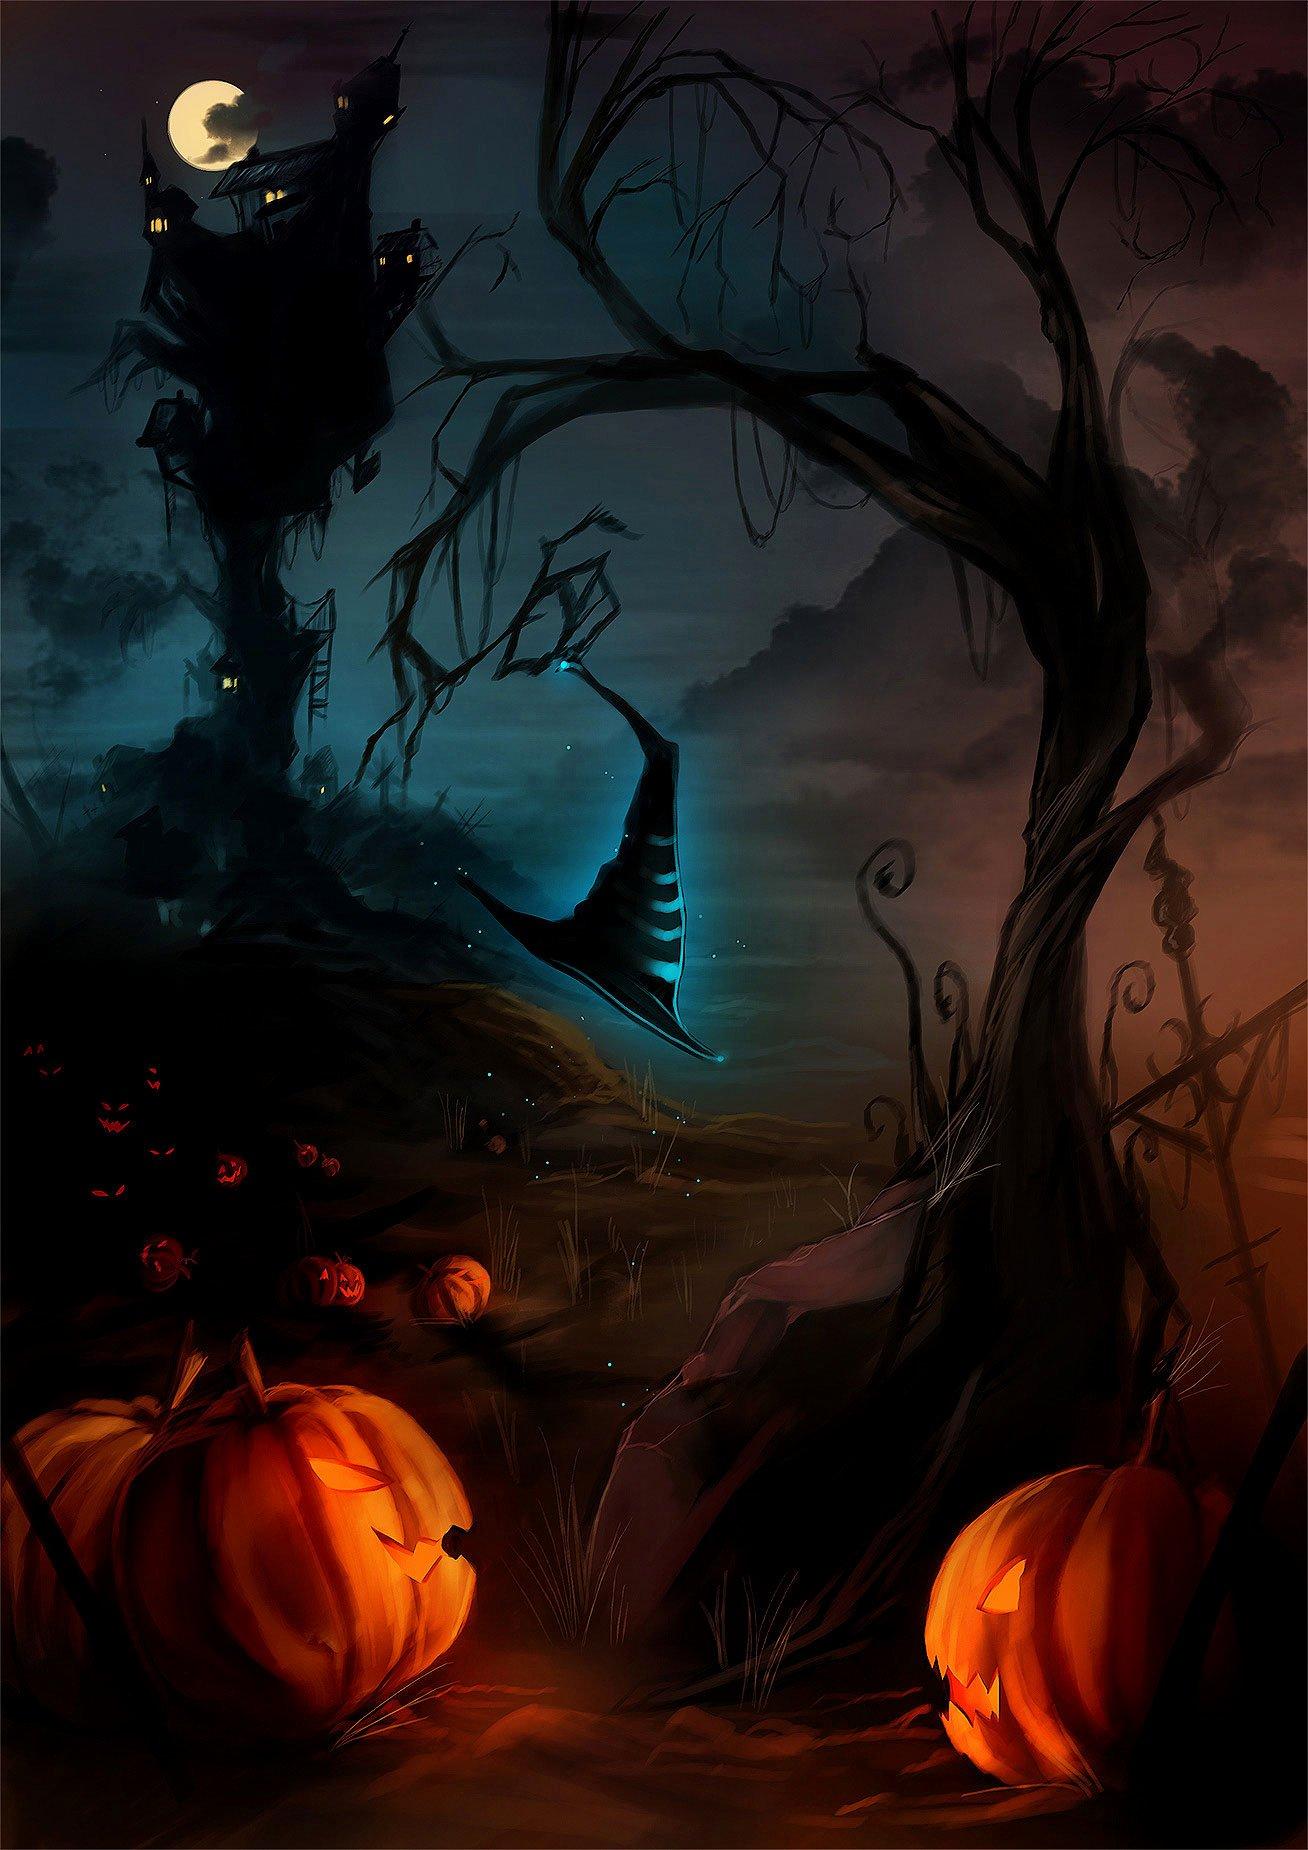 Free Halloween Background Images Elegant Free Halloween 2013 Backgrounds & Wallpapers – Designbolts